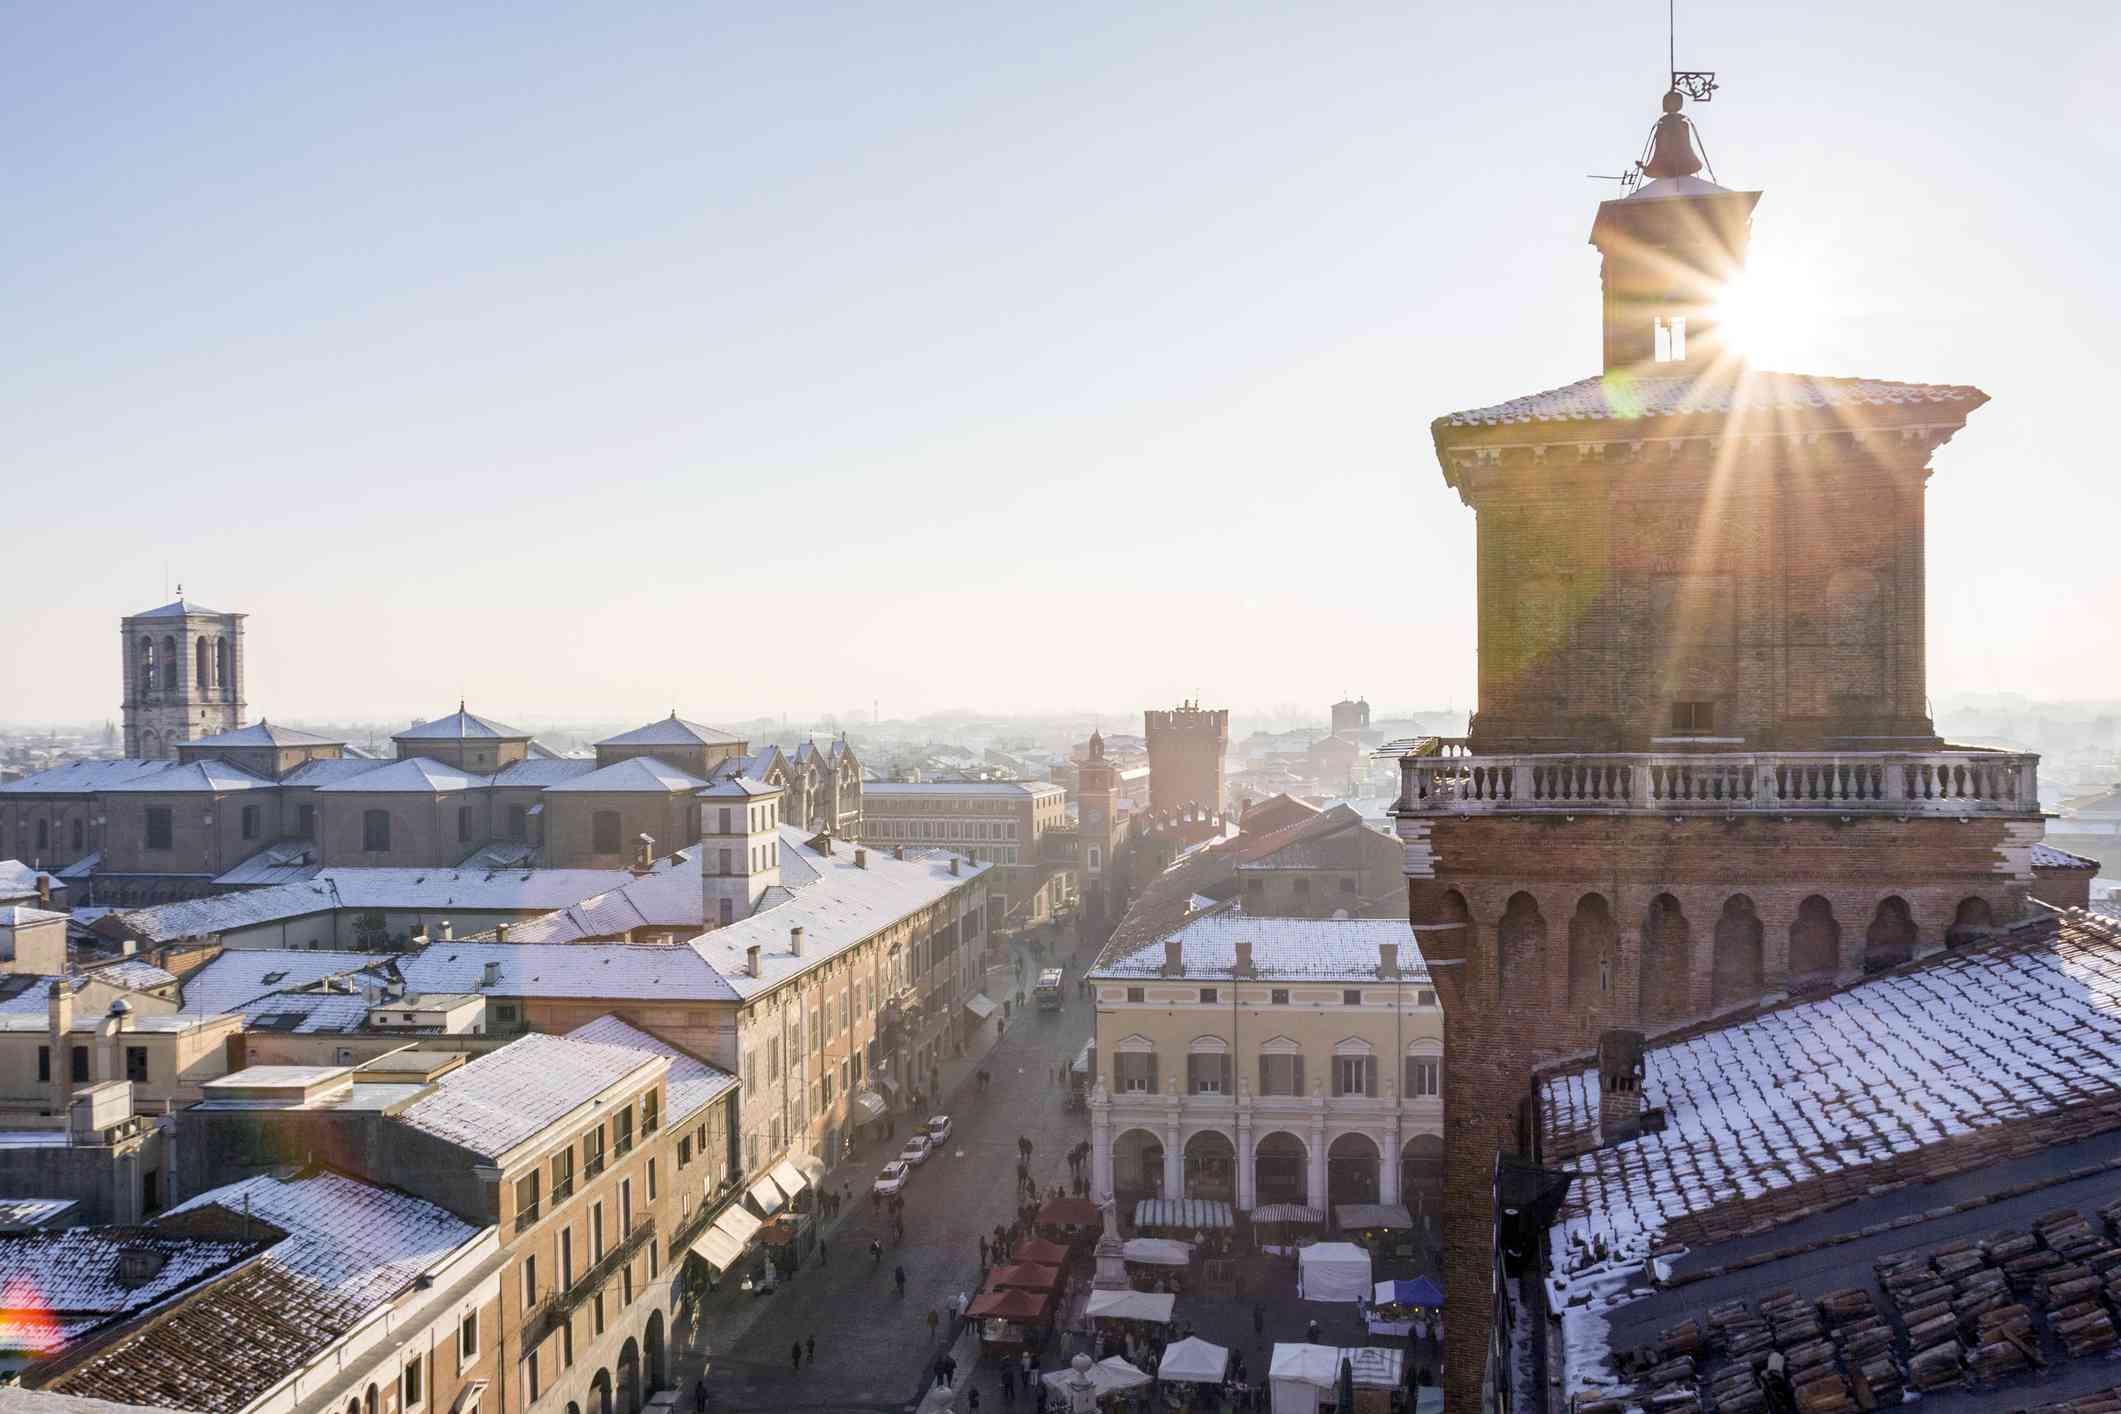 Ferrara, rooftops with winter snow